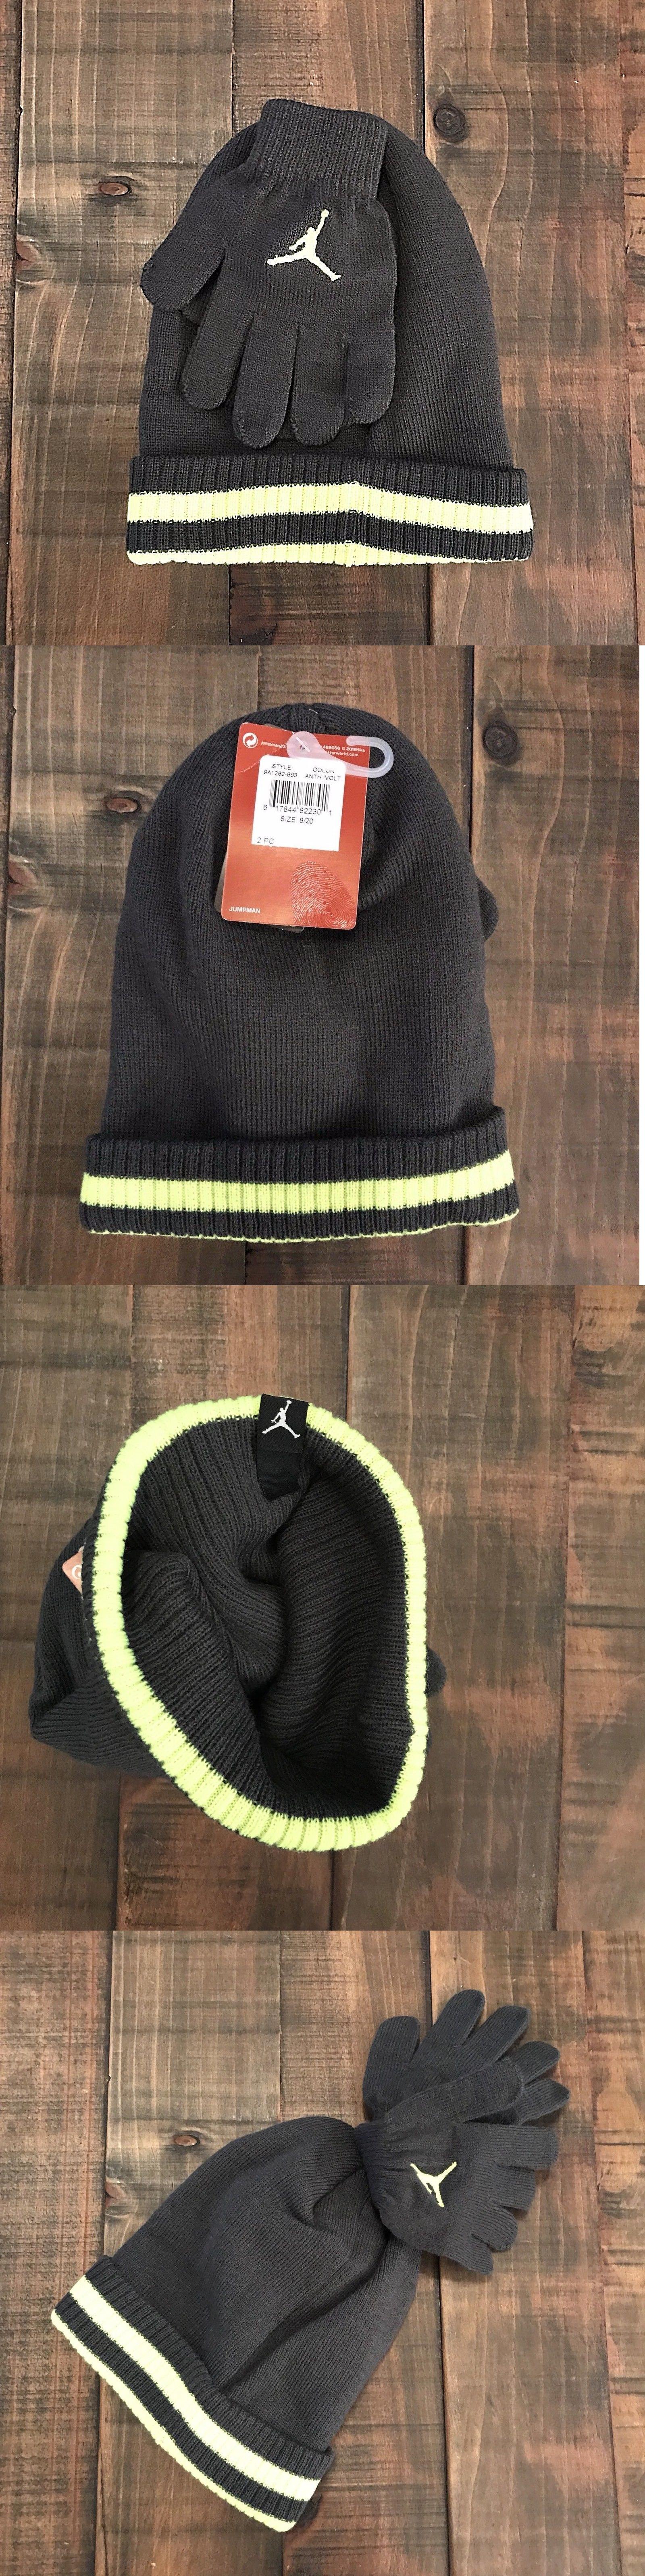 665d4fe39b8 Hats 57884  Nike Air Jordan One Size Beanie And Glove Set Boys Youth 8 20